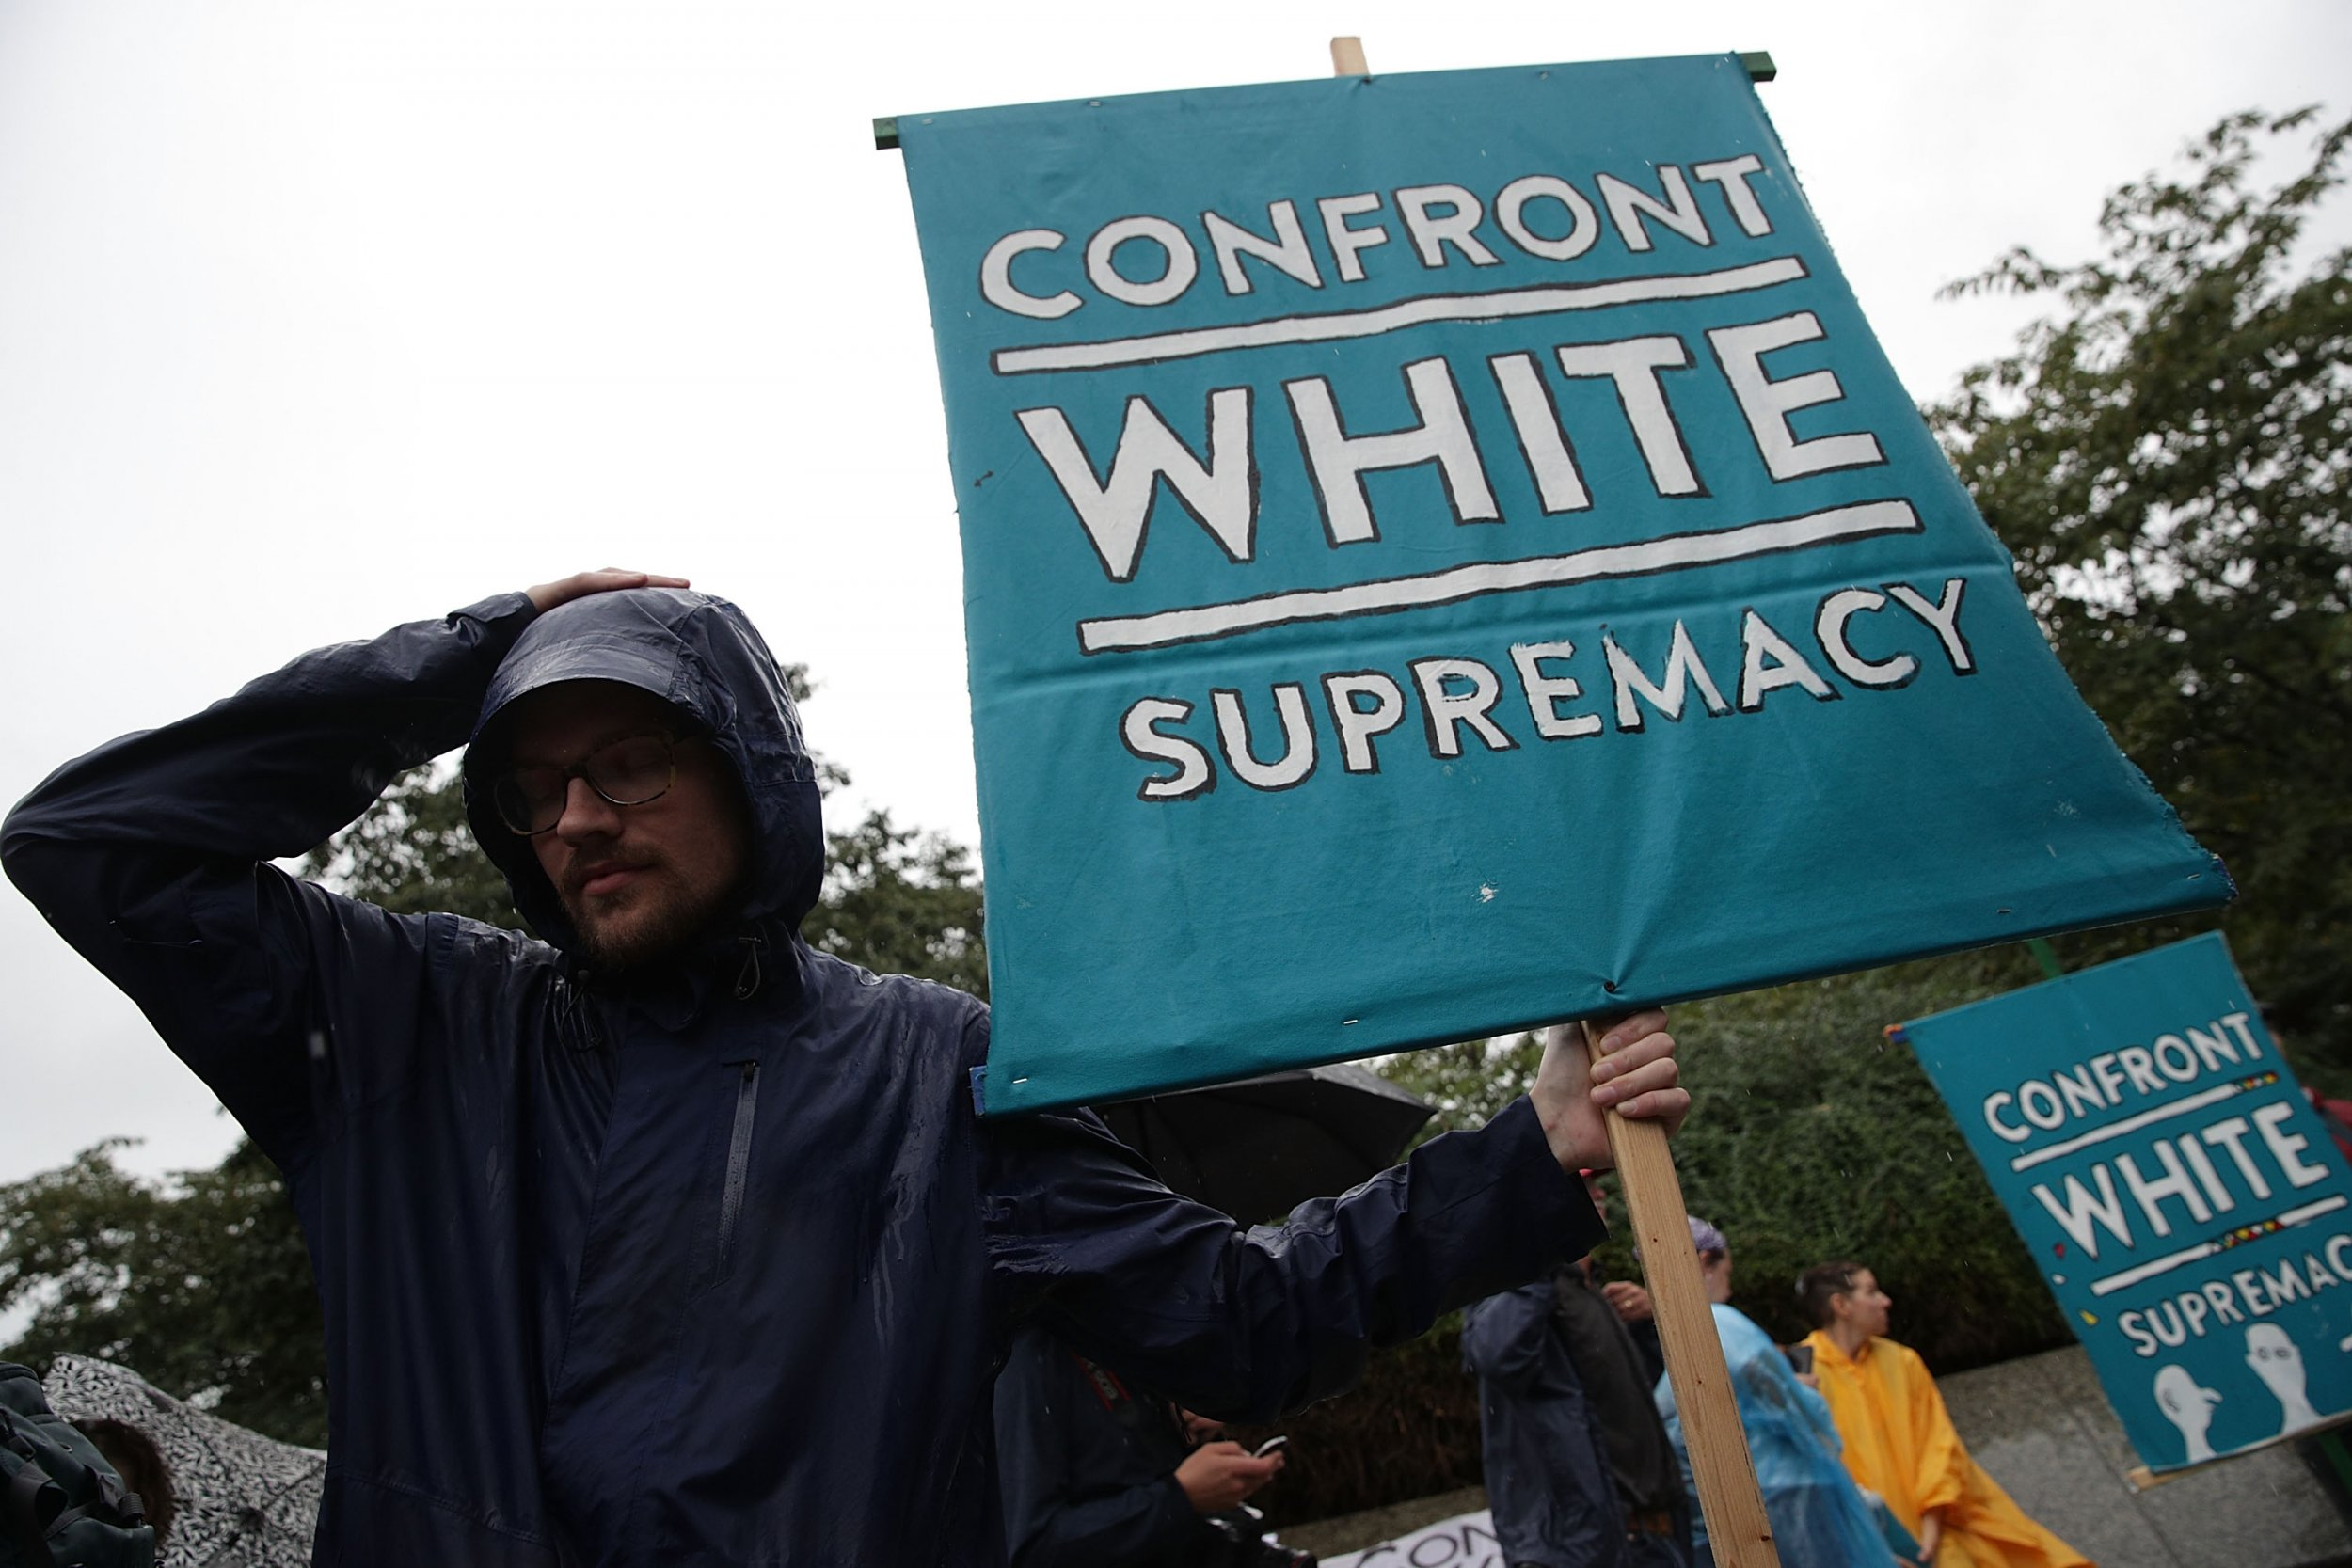 01_09_Whitesupremacy_01